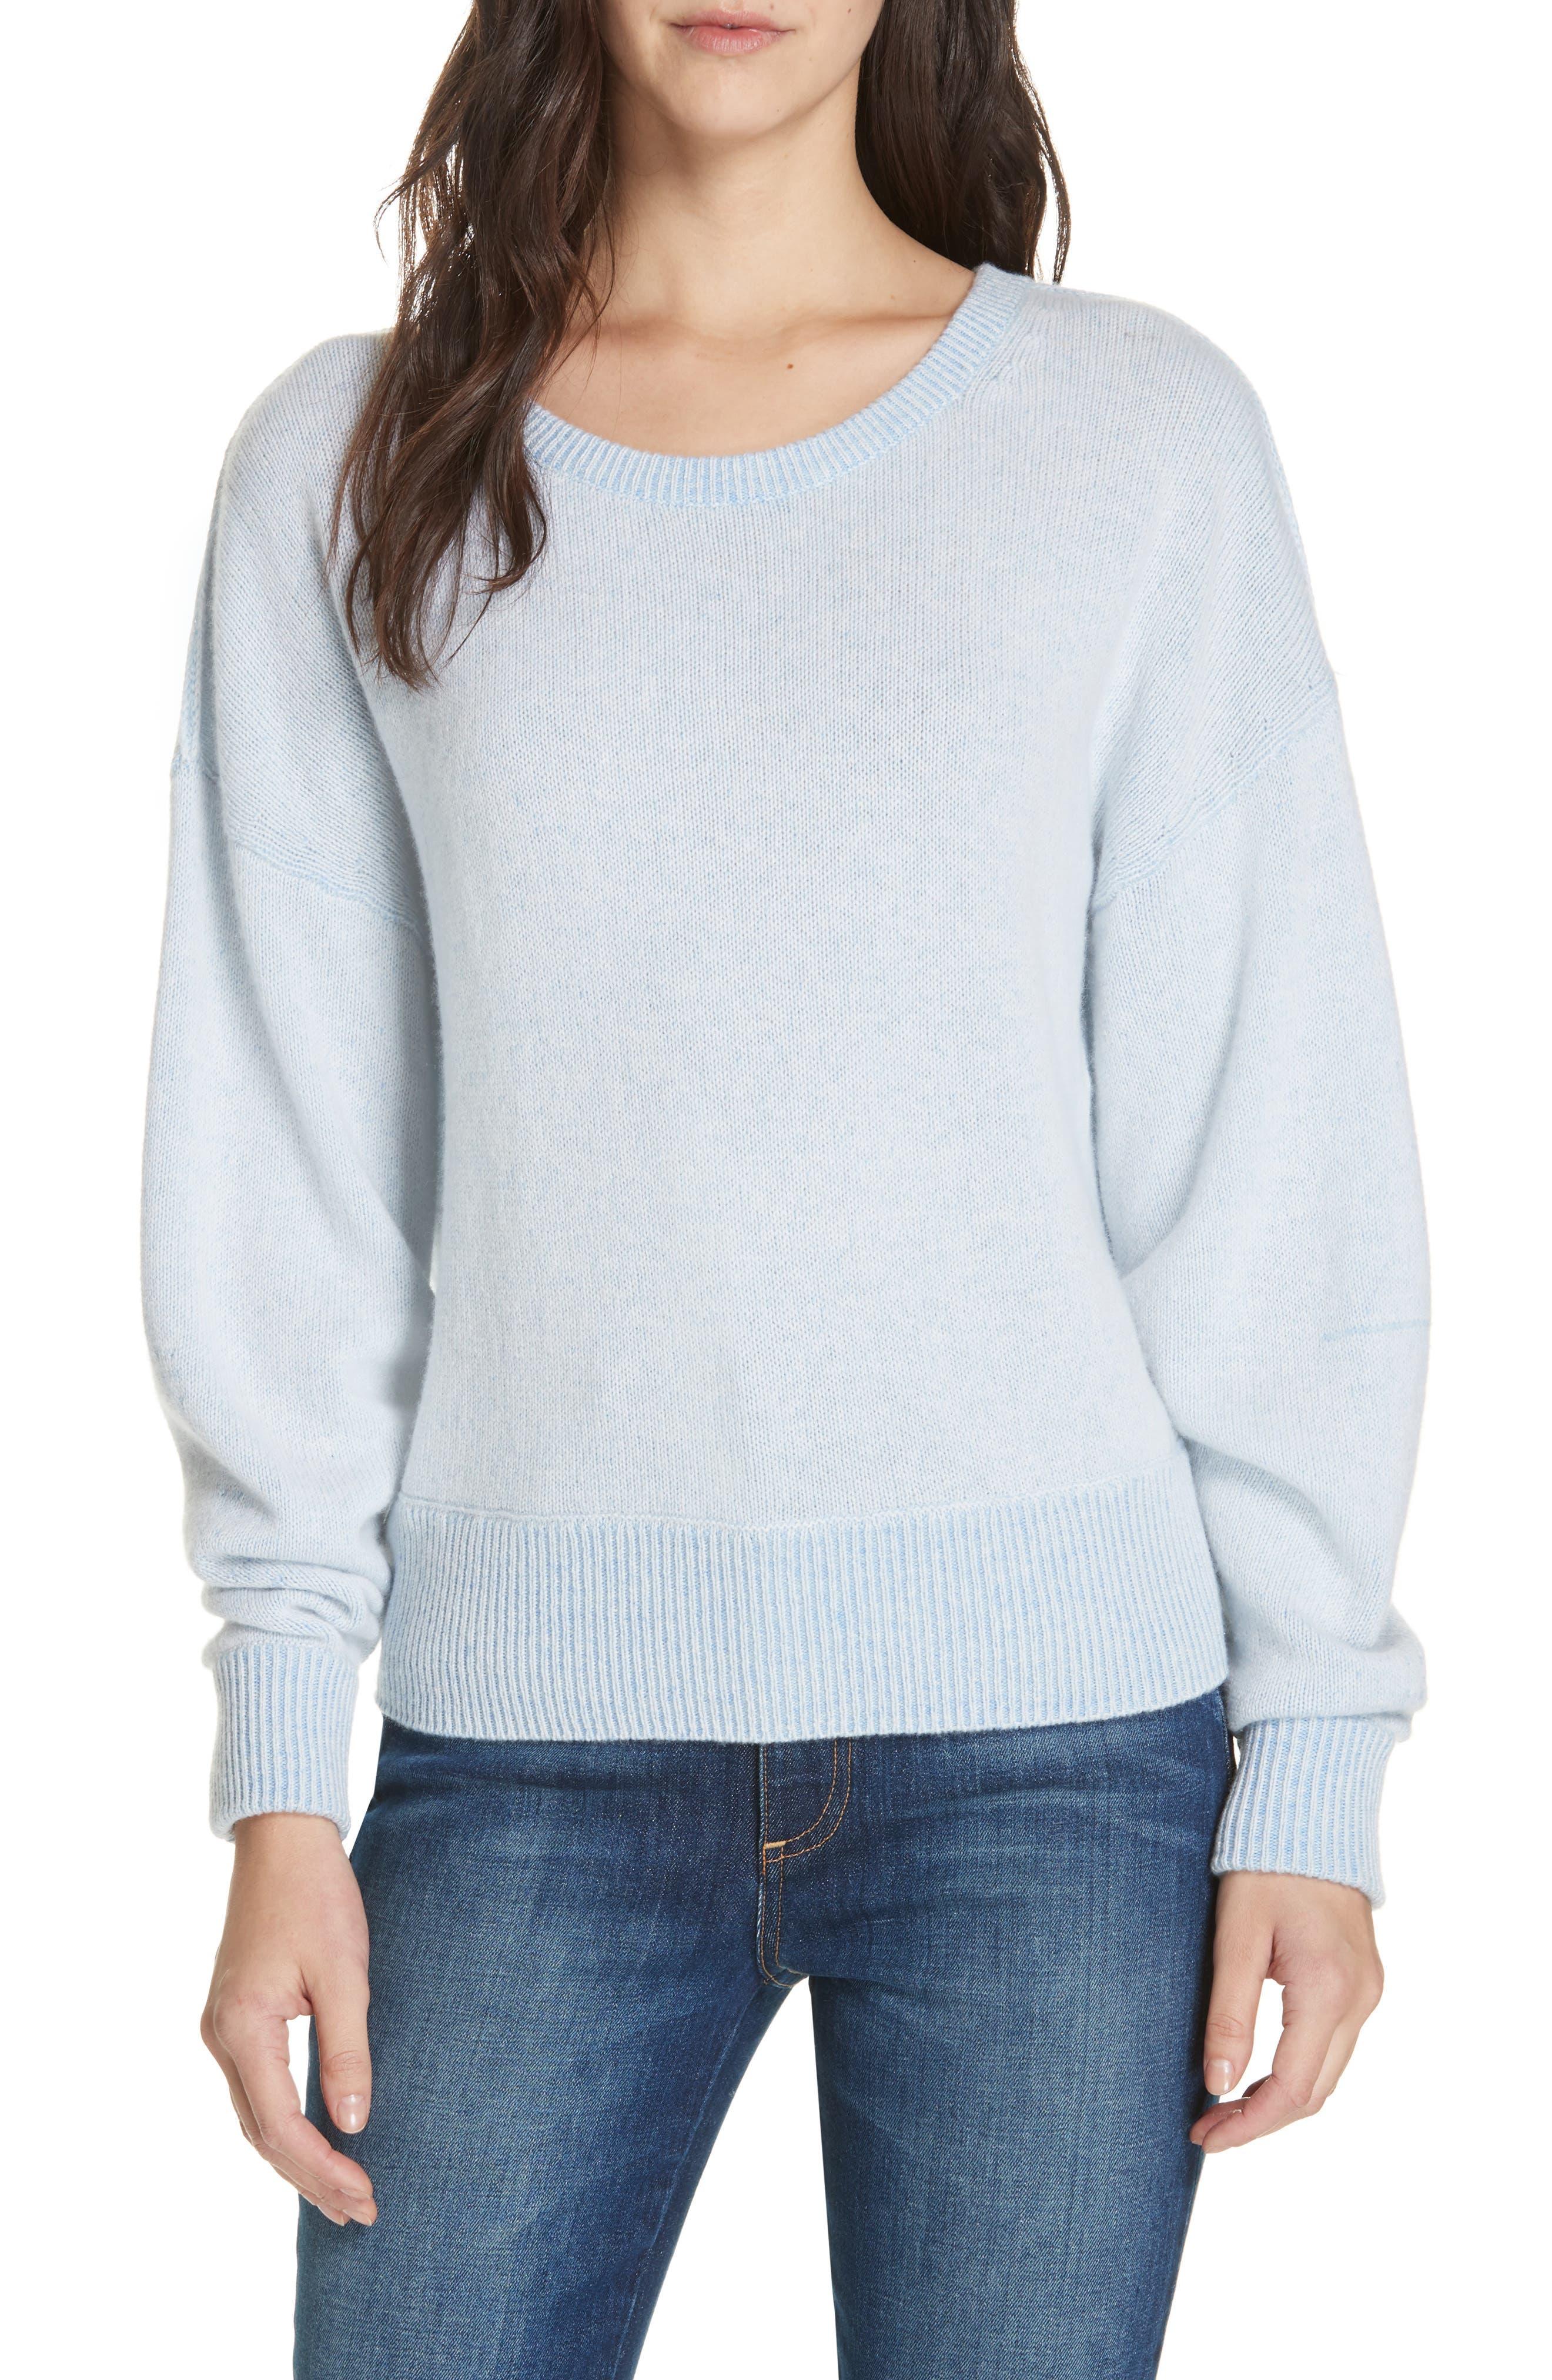 Alta Cashmere Sweater,                             Main thumbnail 1, color,                             SKYLAR BLUE COMBO